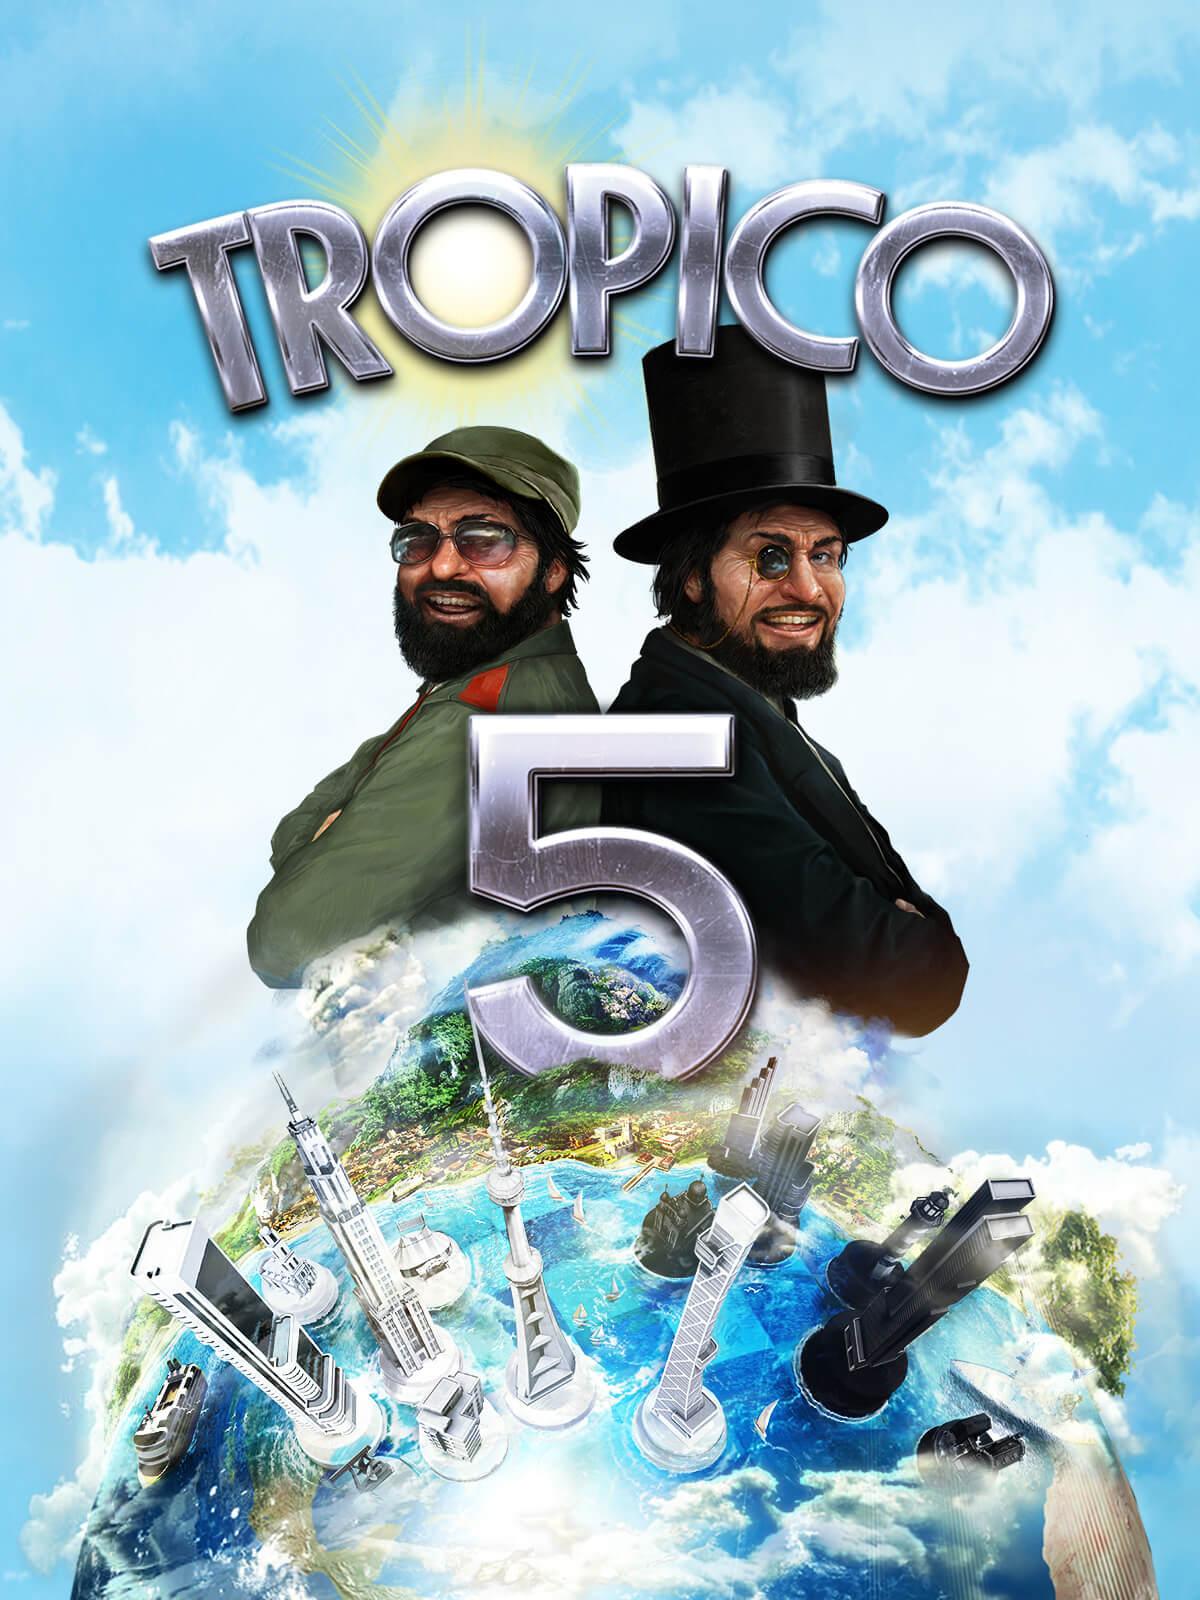 Tropico 5 za darmo na Epic Store Games od 23.12